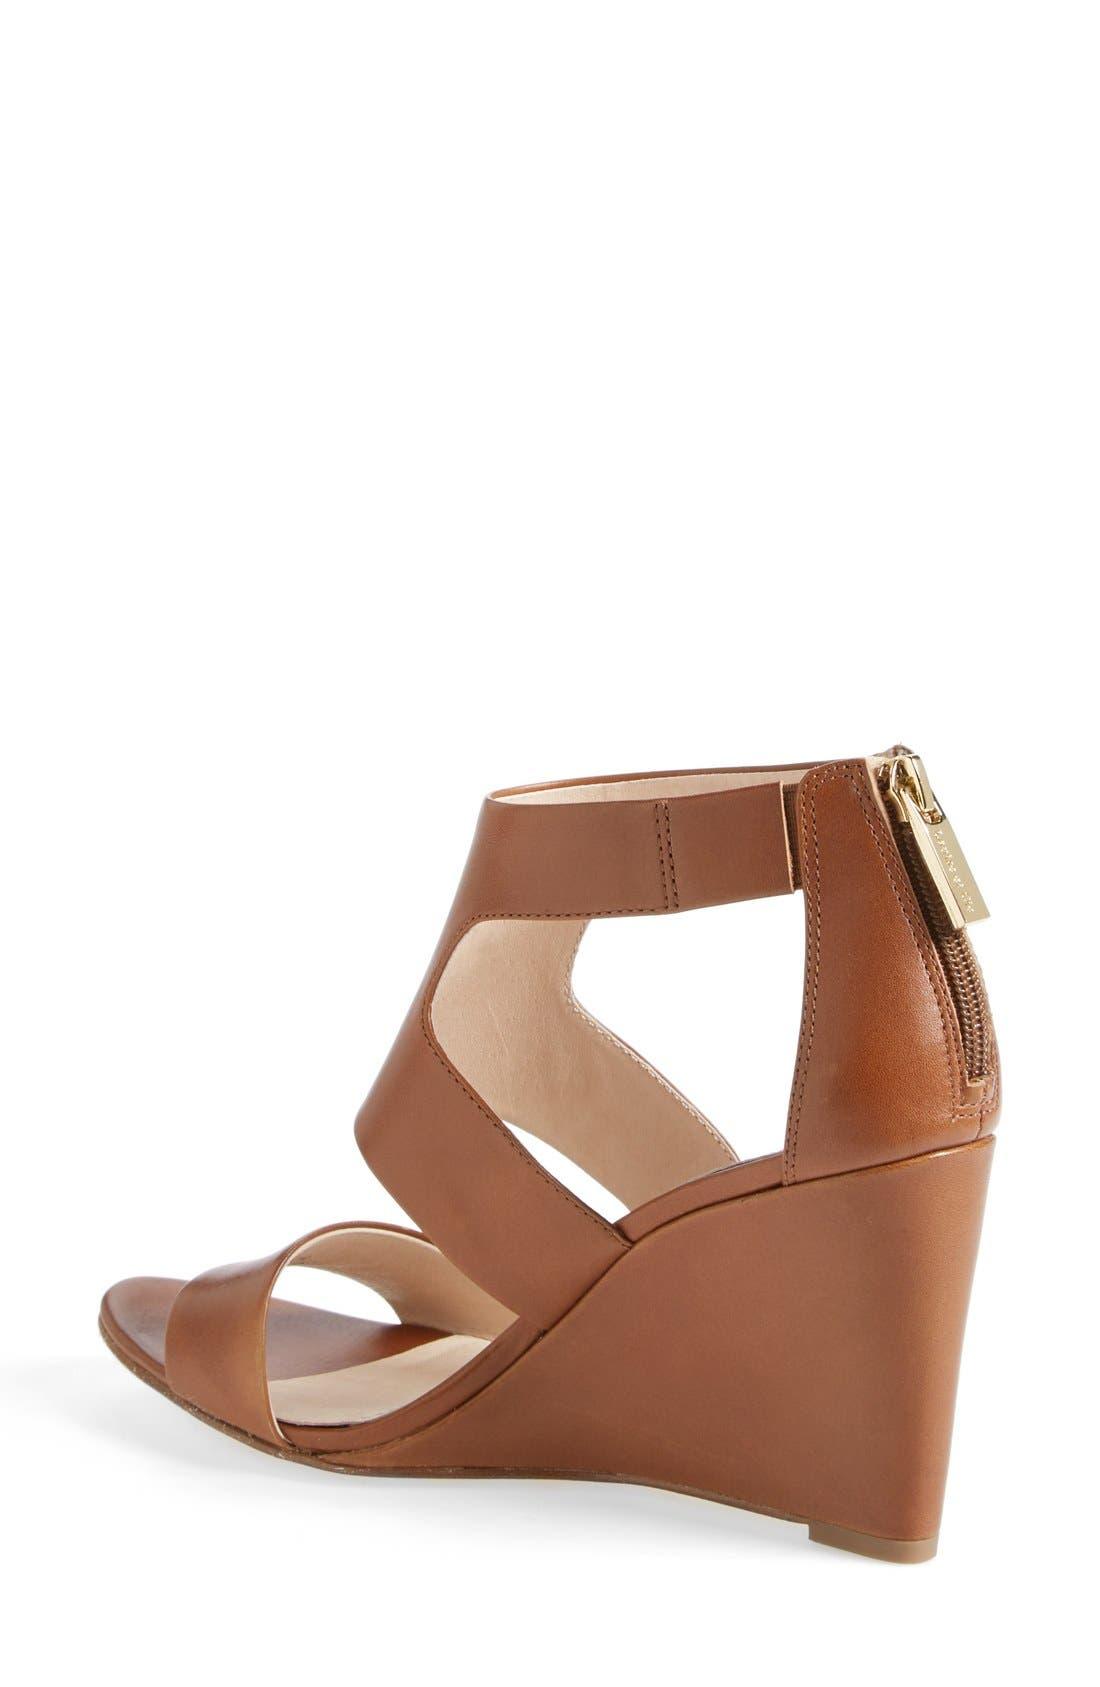 Alternate Image 2  - Louise et Cie 'Rozza' Leather Wedge Sandal (Women)